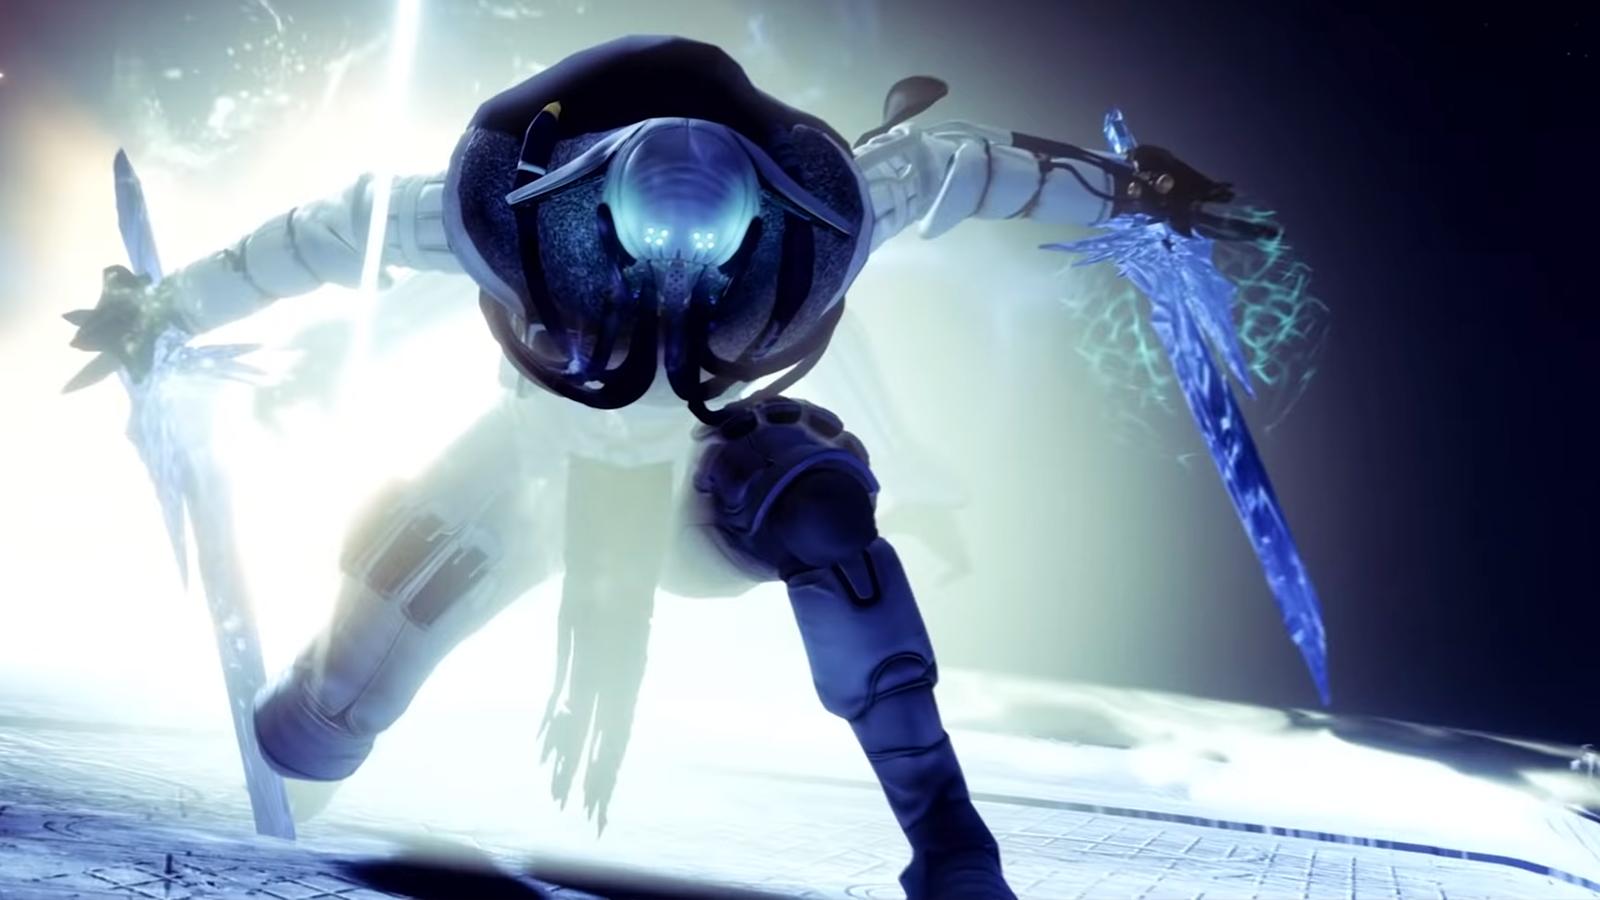 Destiny 2 Fallen uses new Stasis element in Beyond Light.